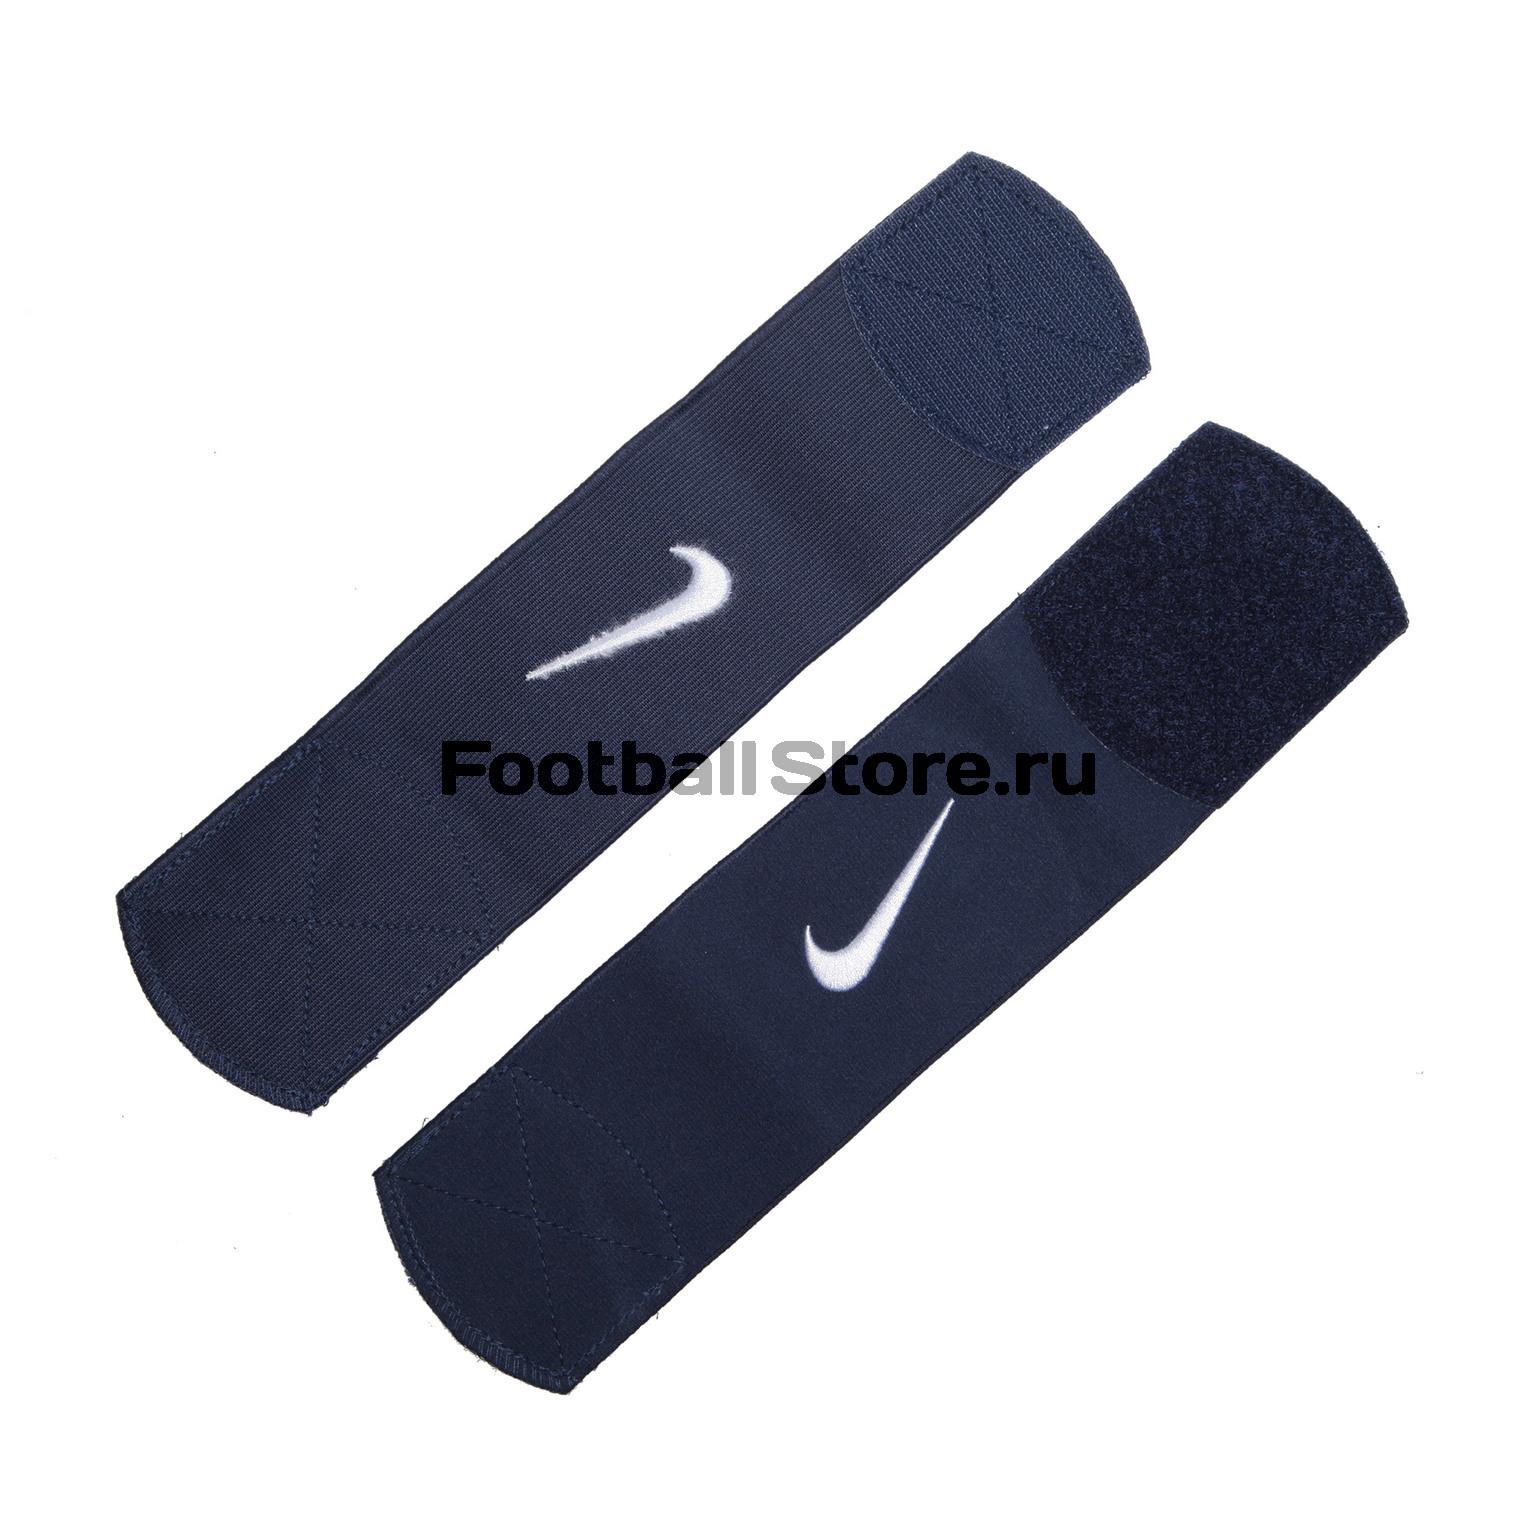 Повязка для фиксации щитка Nike SE0047-401 алексей архиповский 2020 02 15t20 30